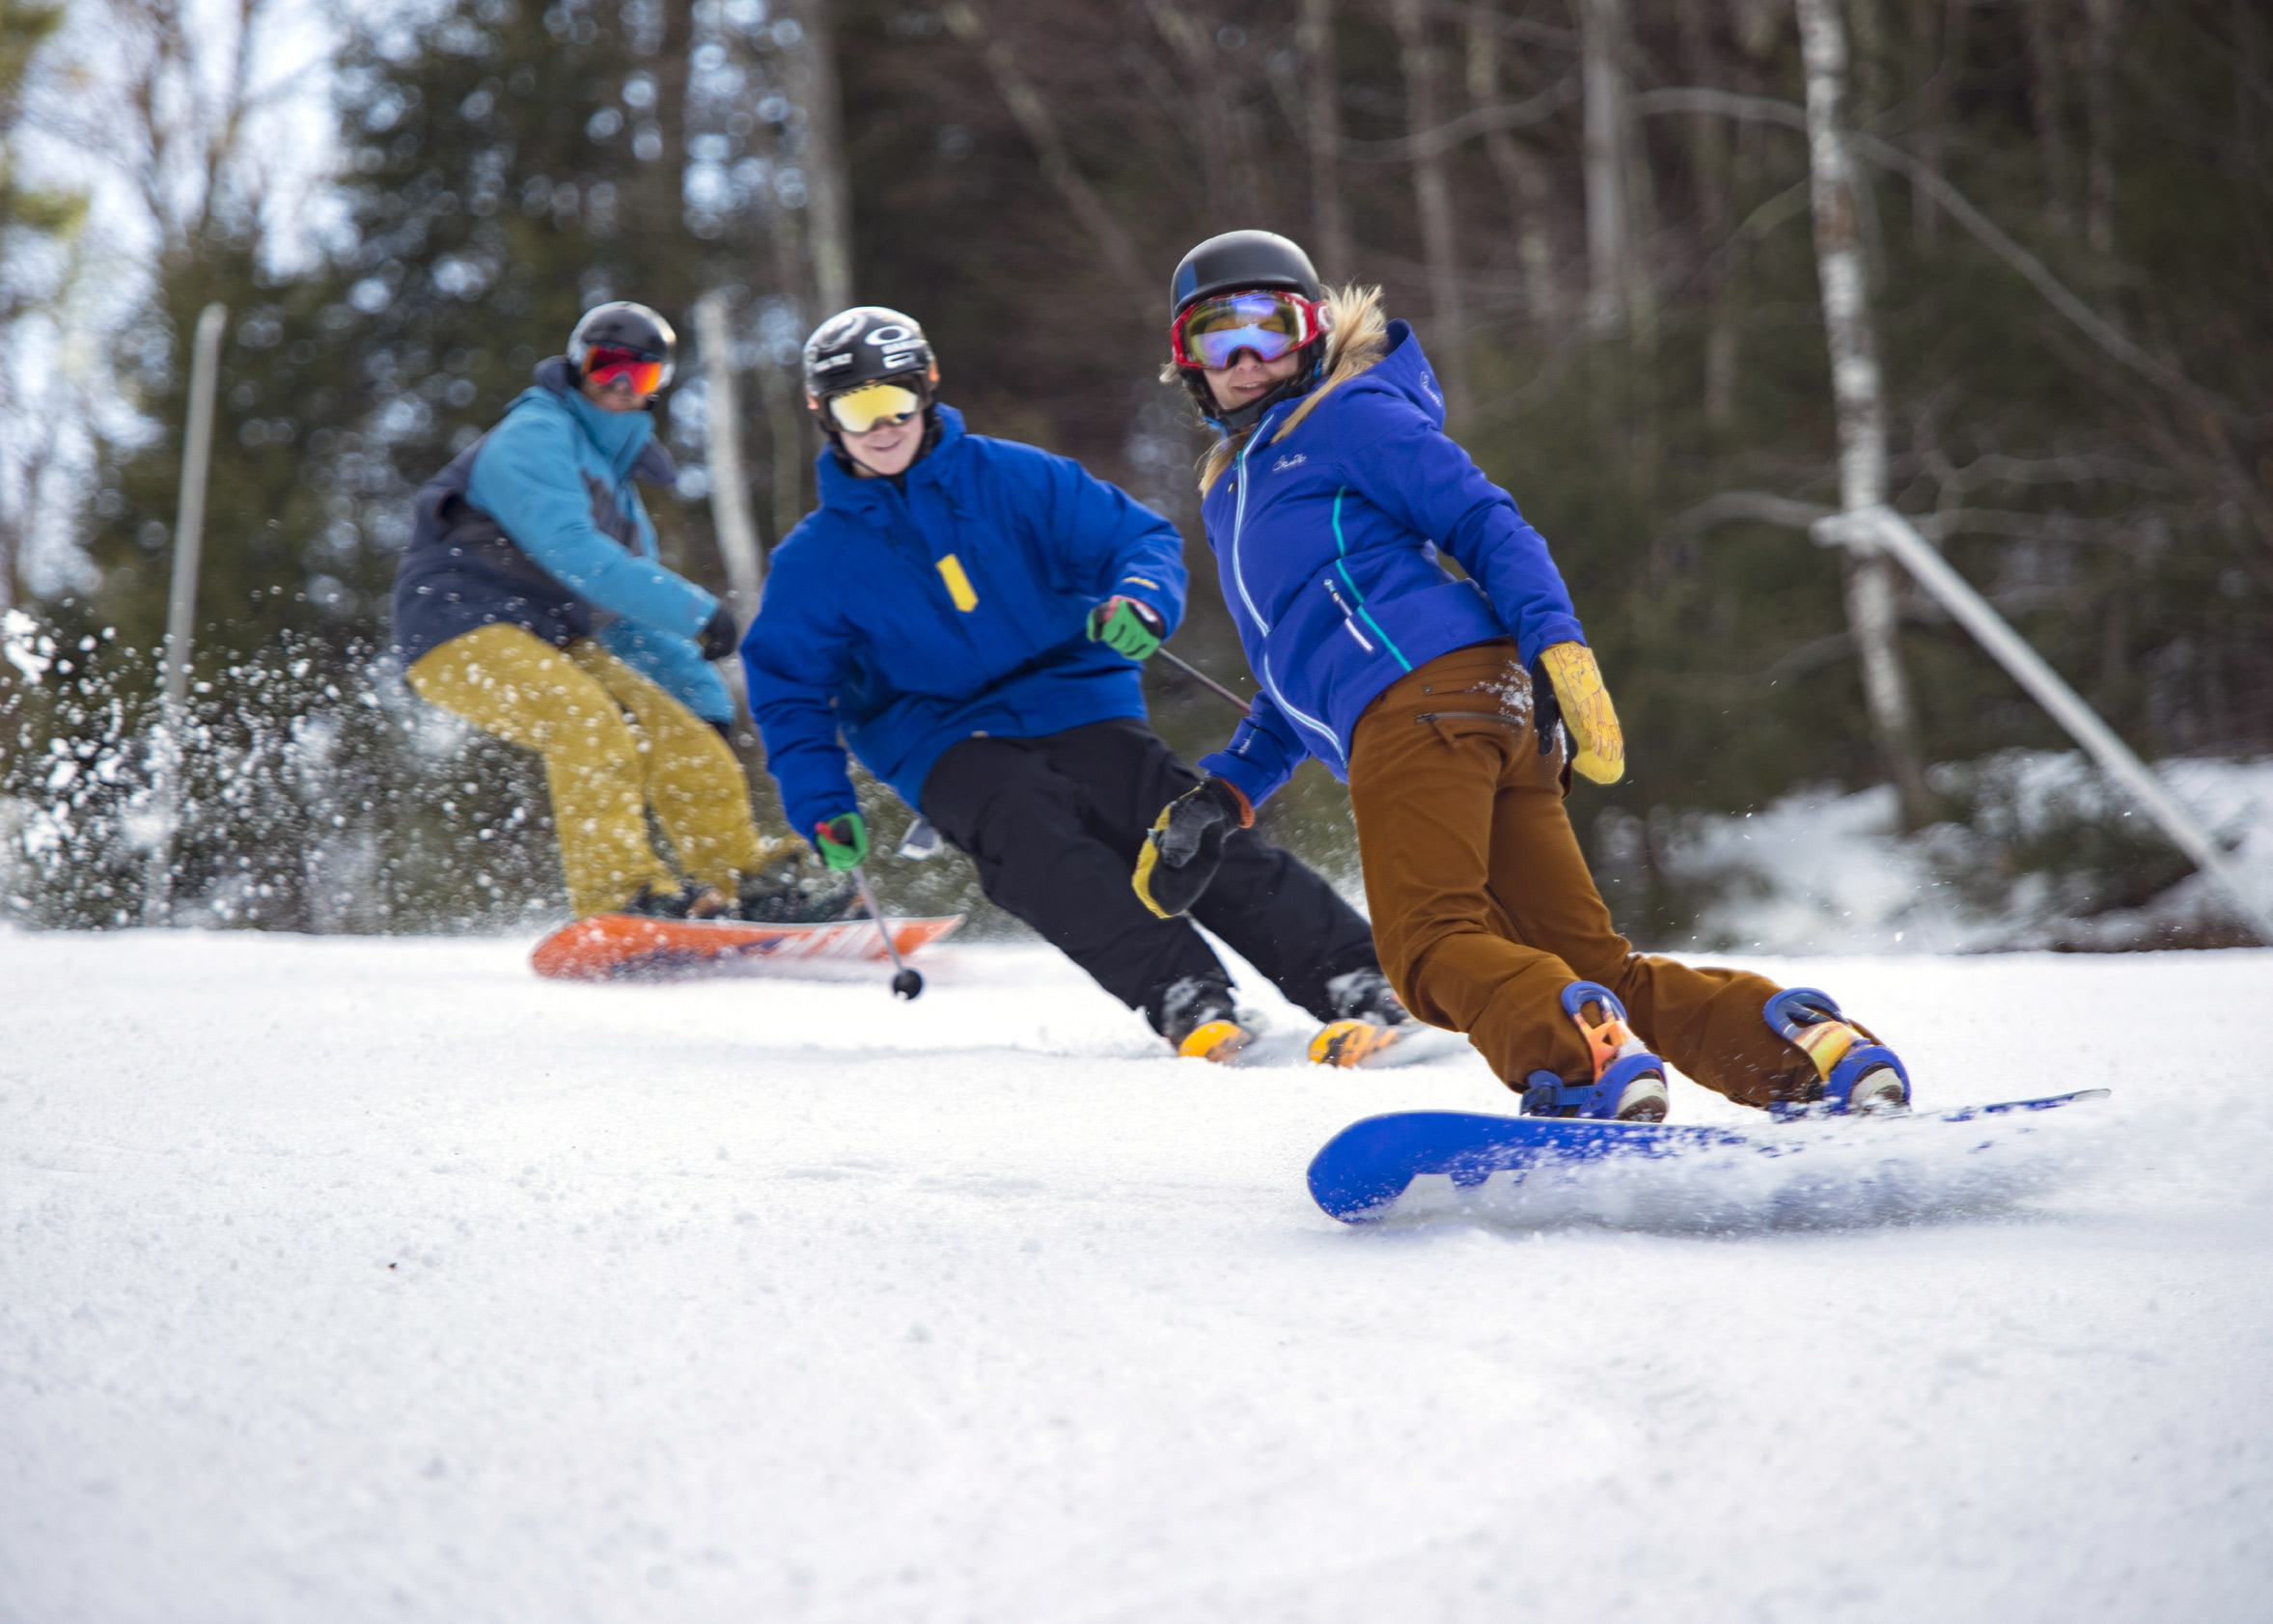 pats peak - pats peak ski area in henniker, nh is southern new